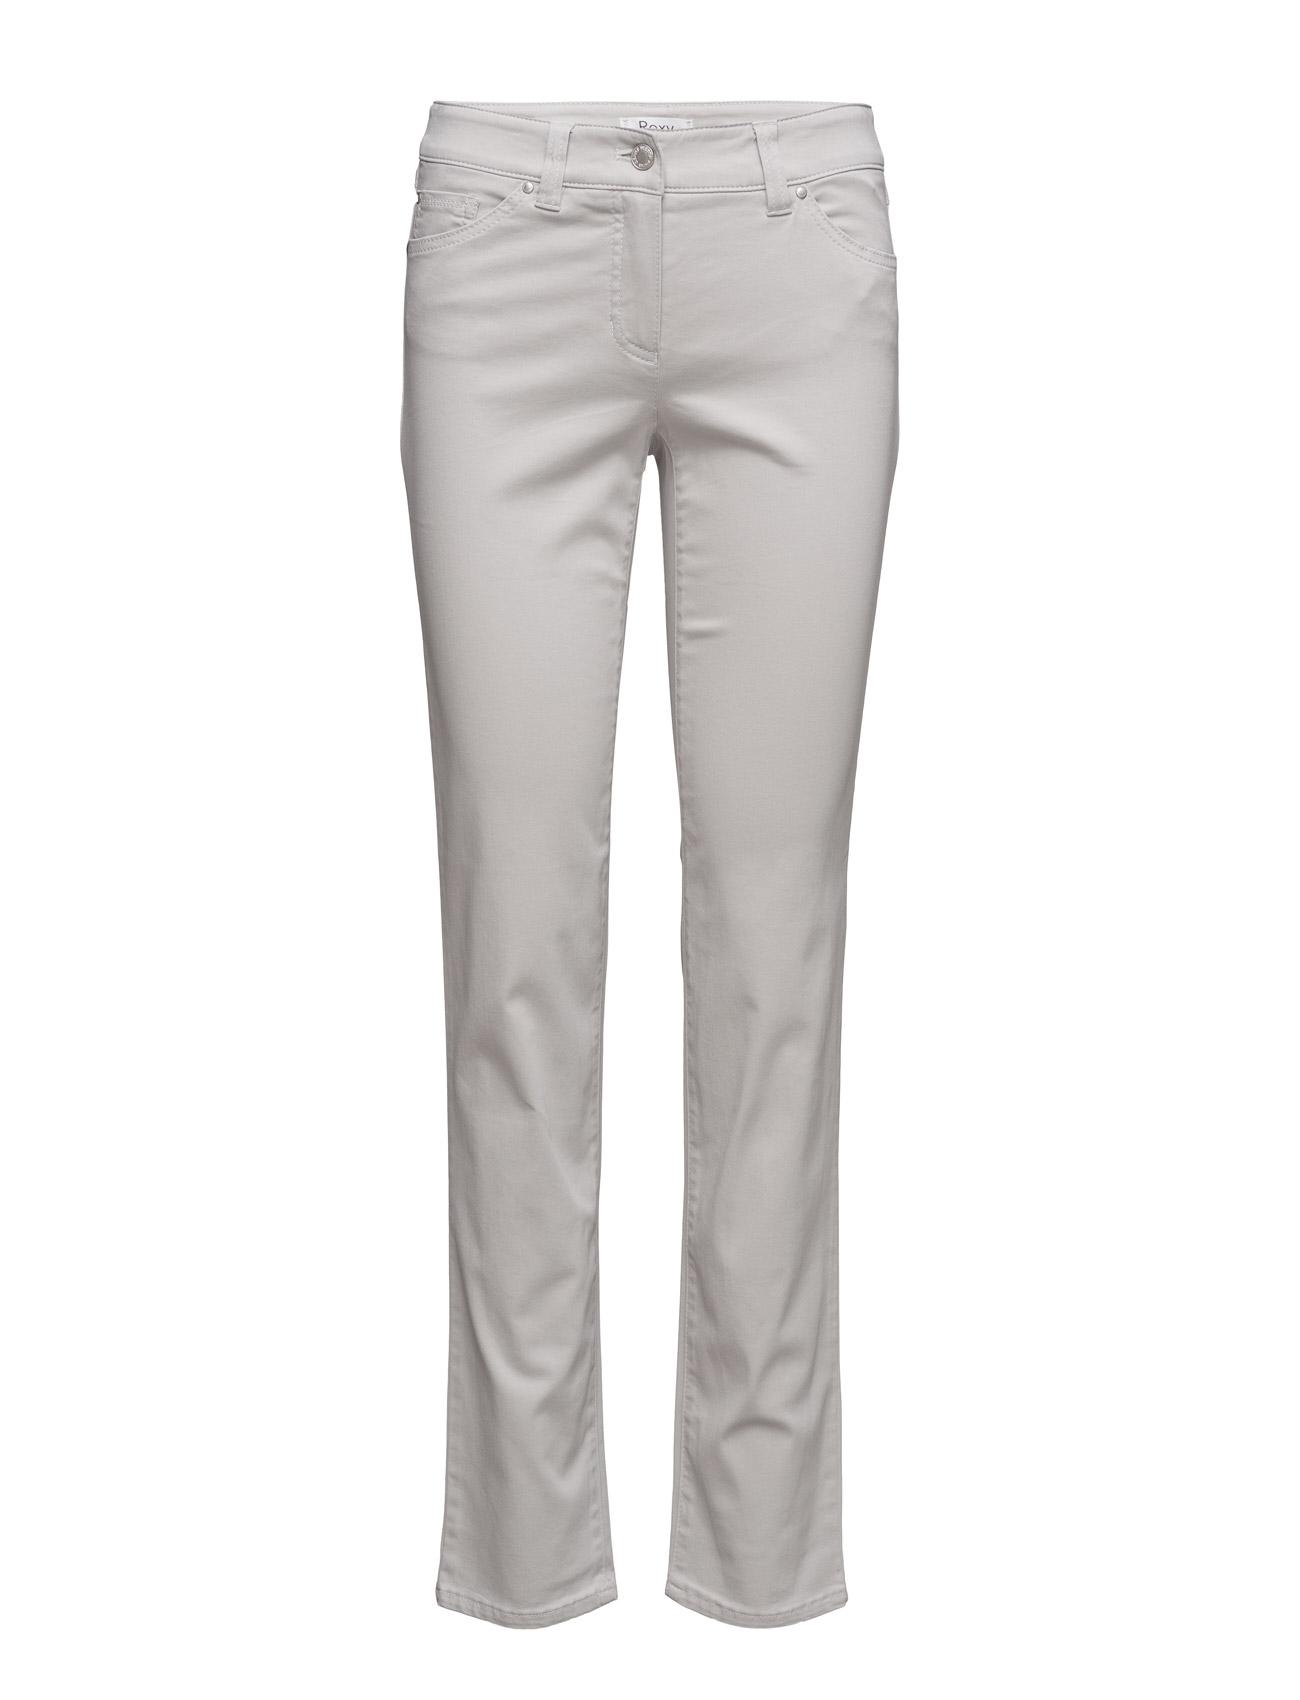 Köpa billiga Leisure Trousers Lon online ce8777d0578e6